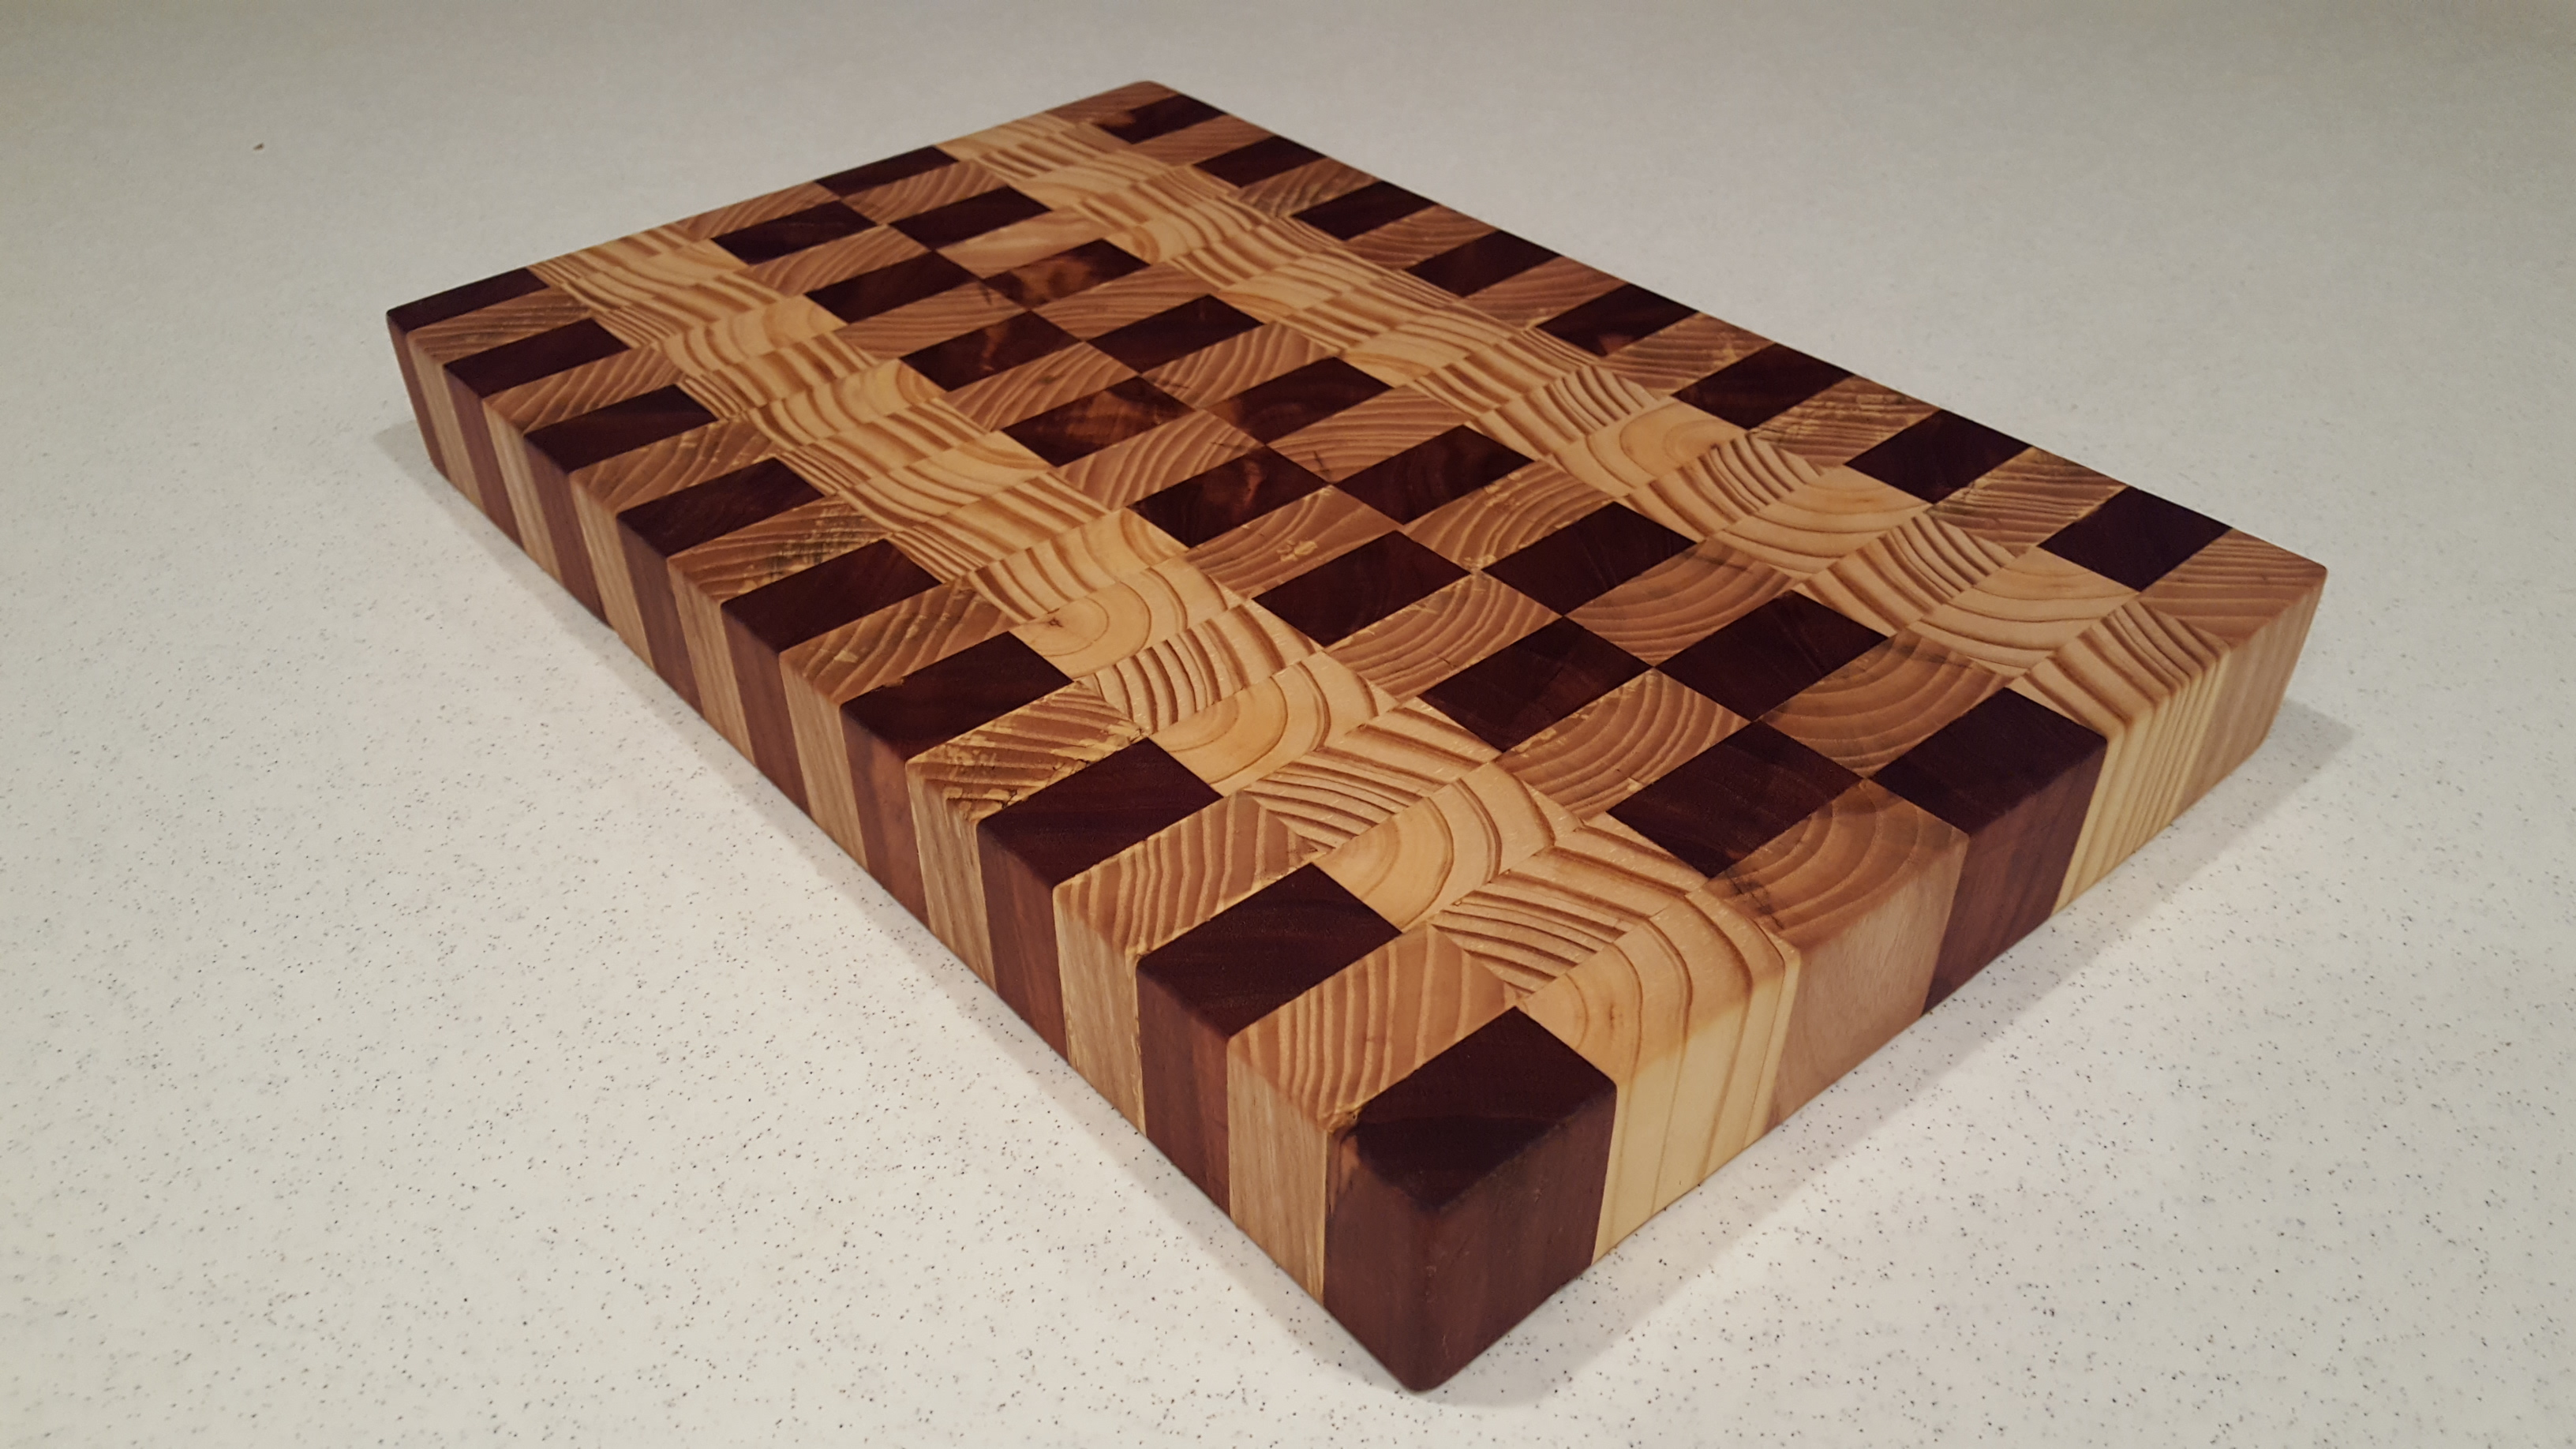 Multi Wood End Grain Cutting Board Blair Wrye Designs